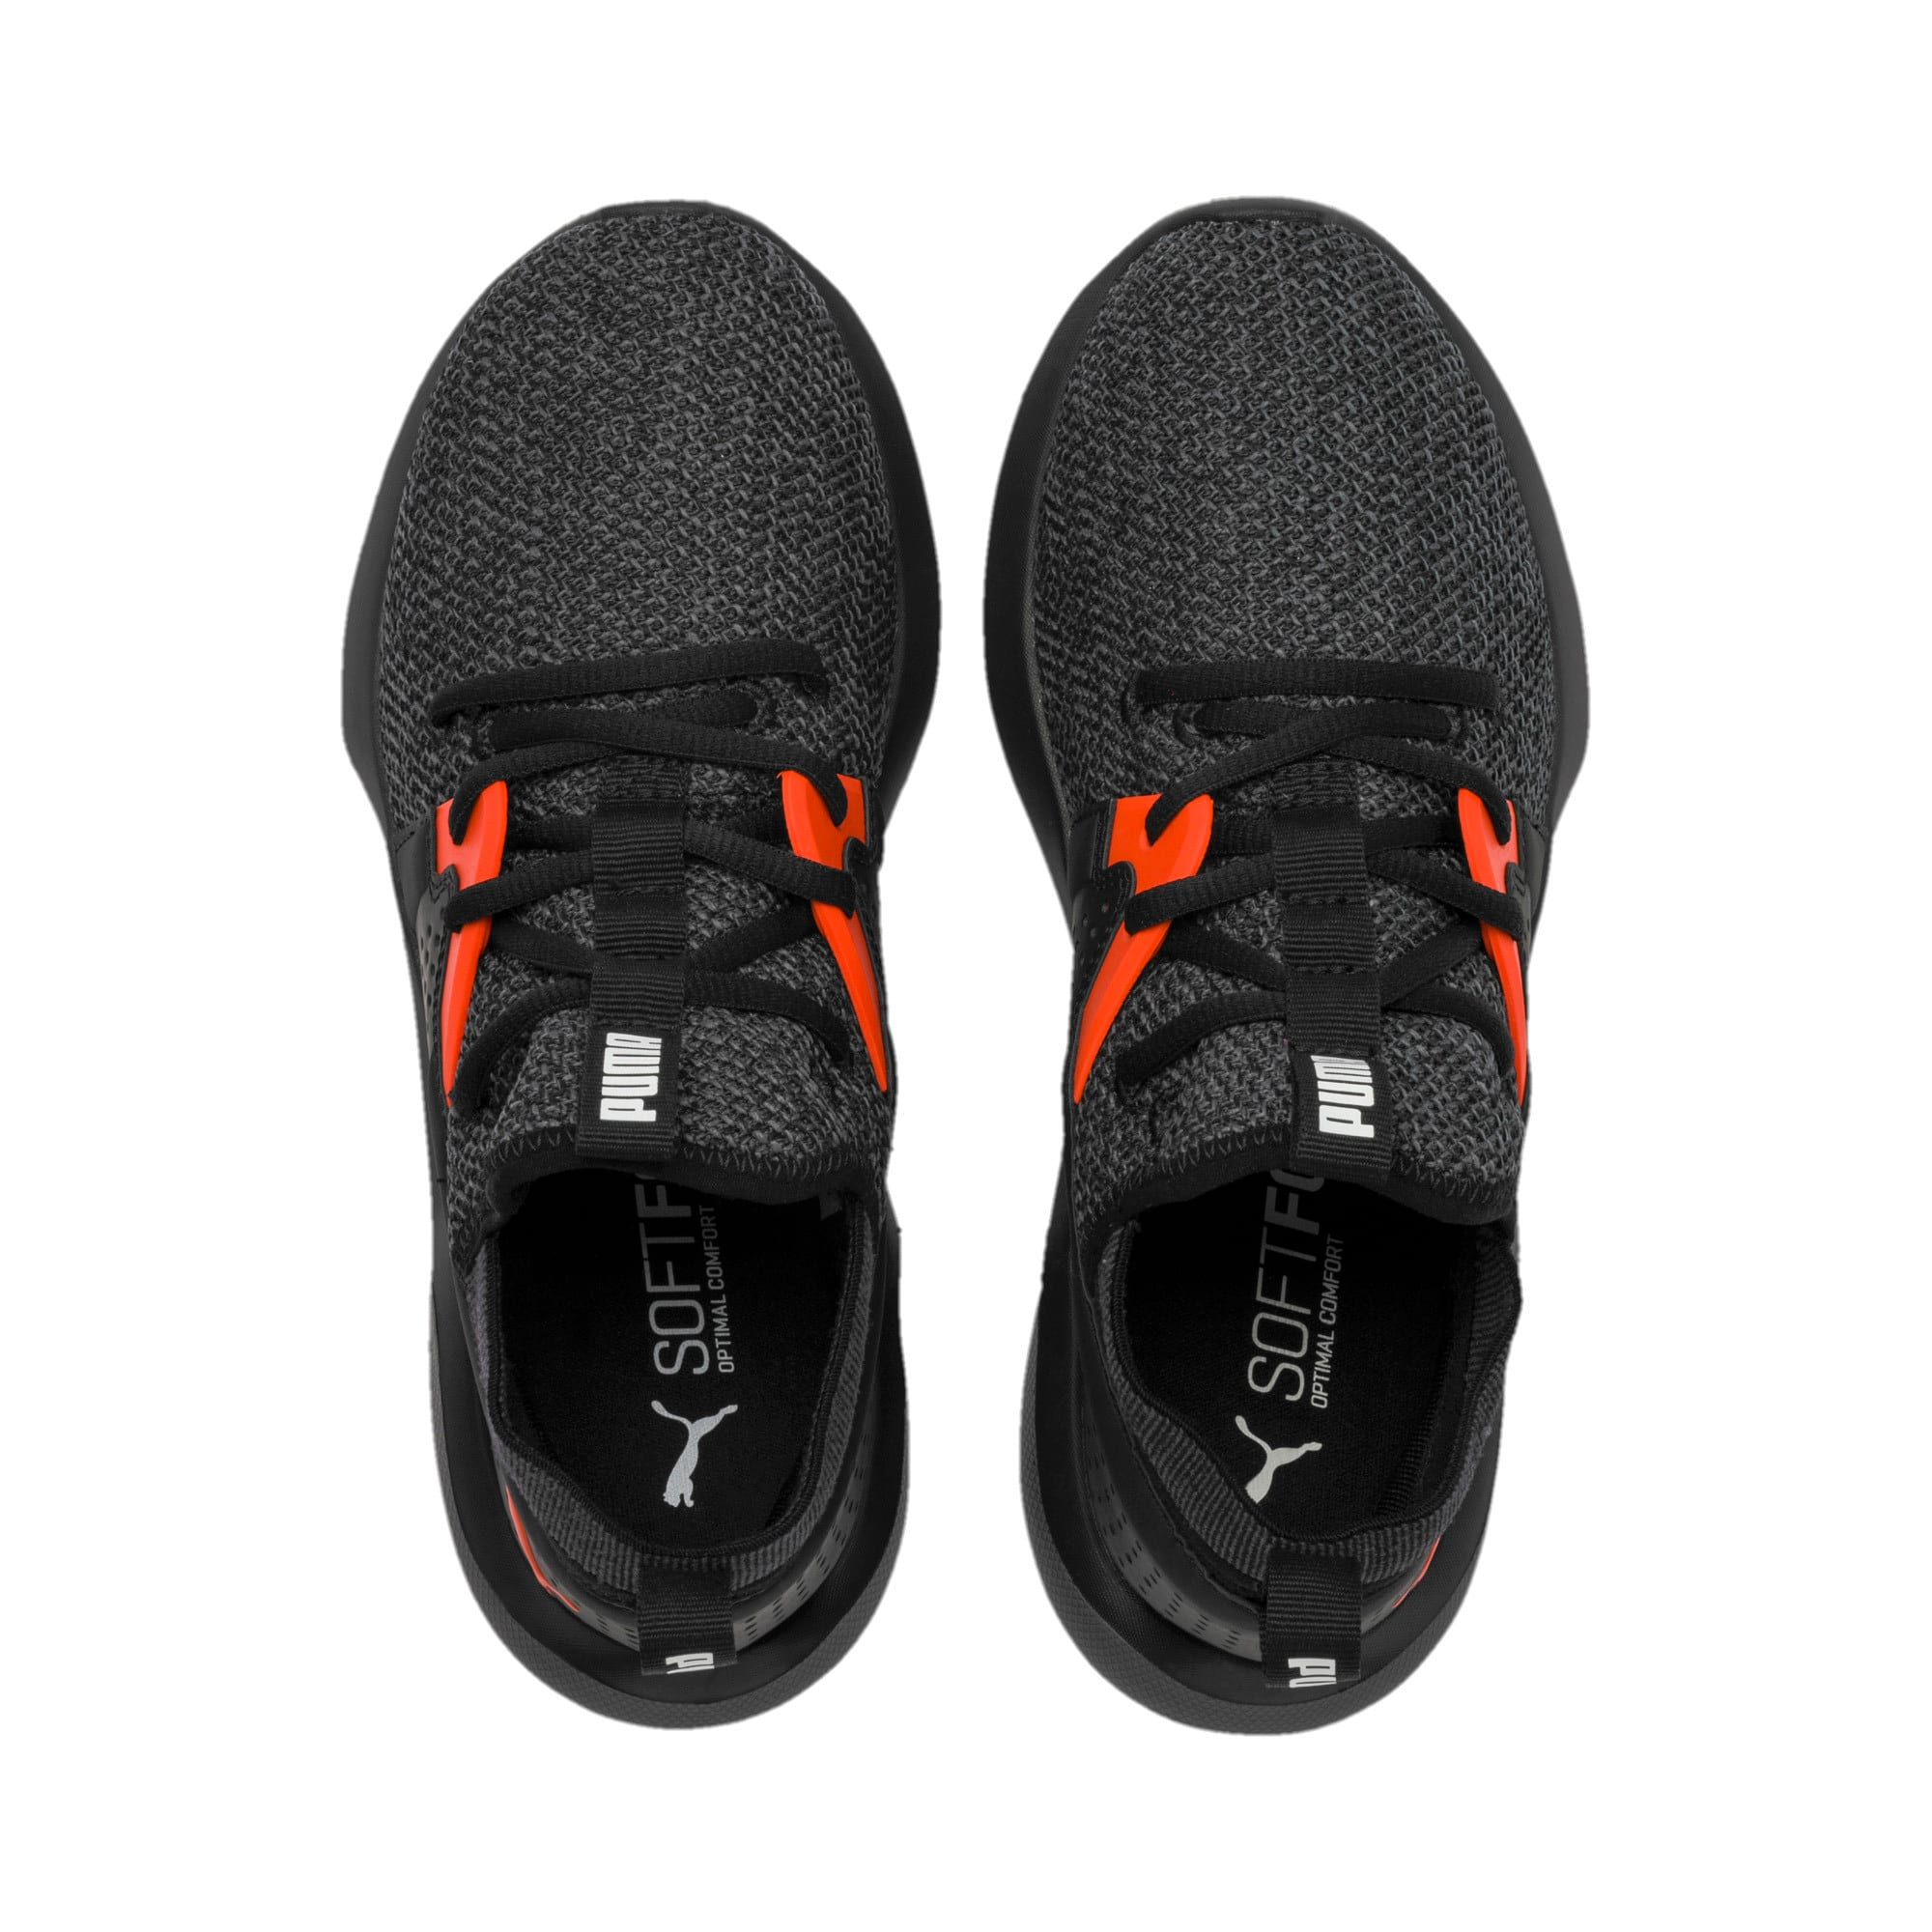 Thumbnail 6 of Emergence Sneakers JR, Puma Black-Cherry Tomato, medium